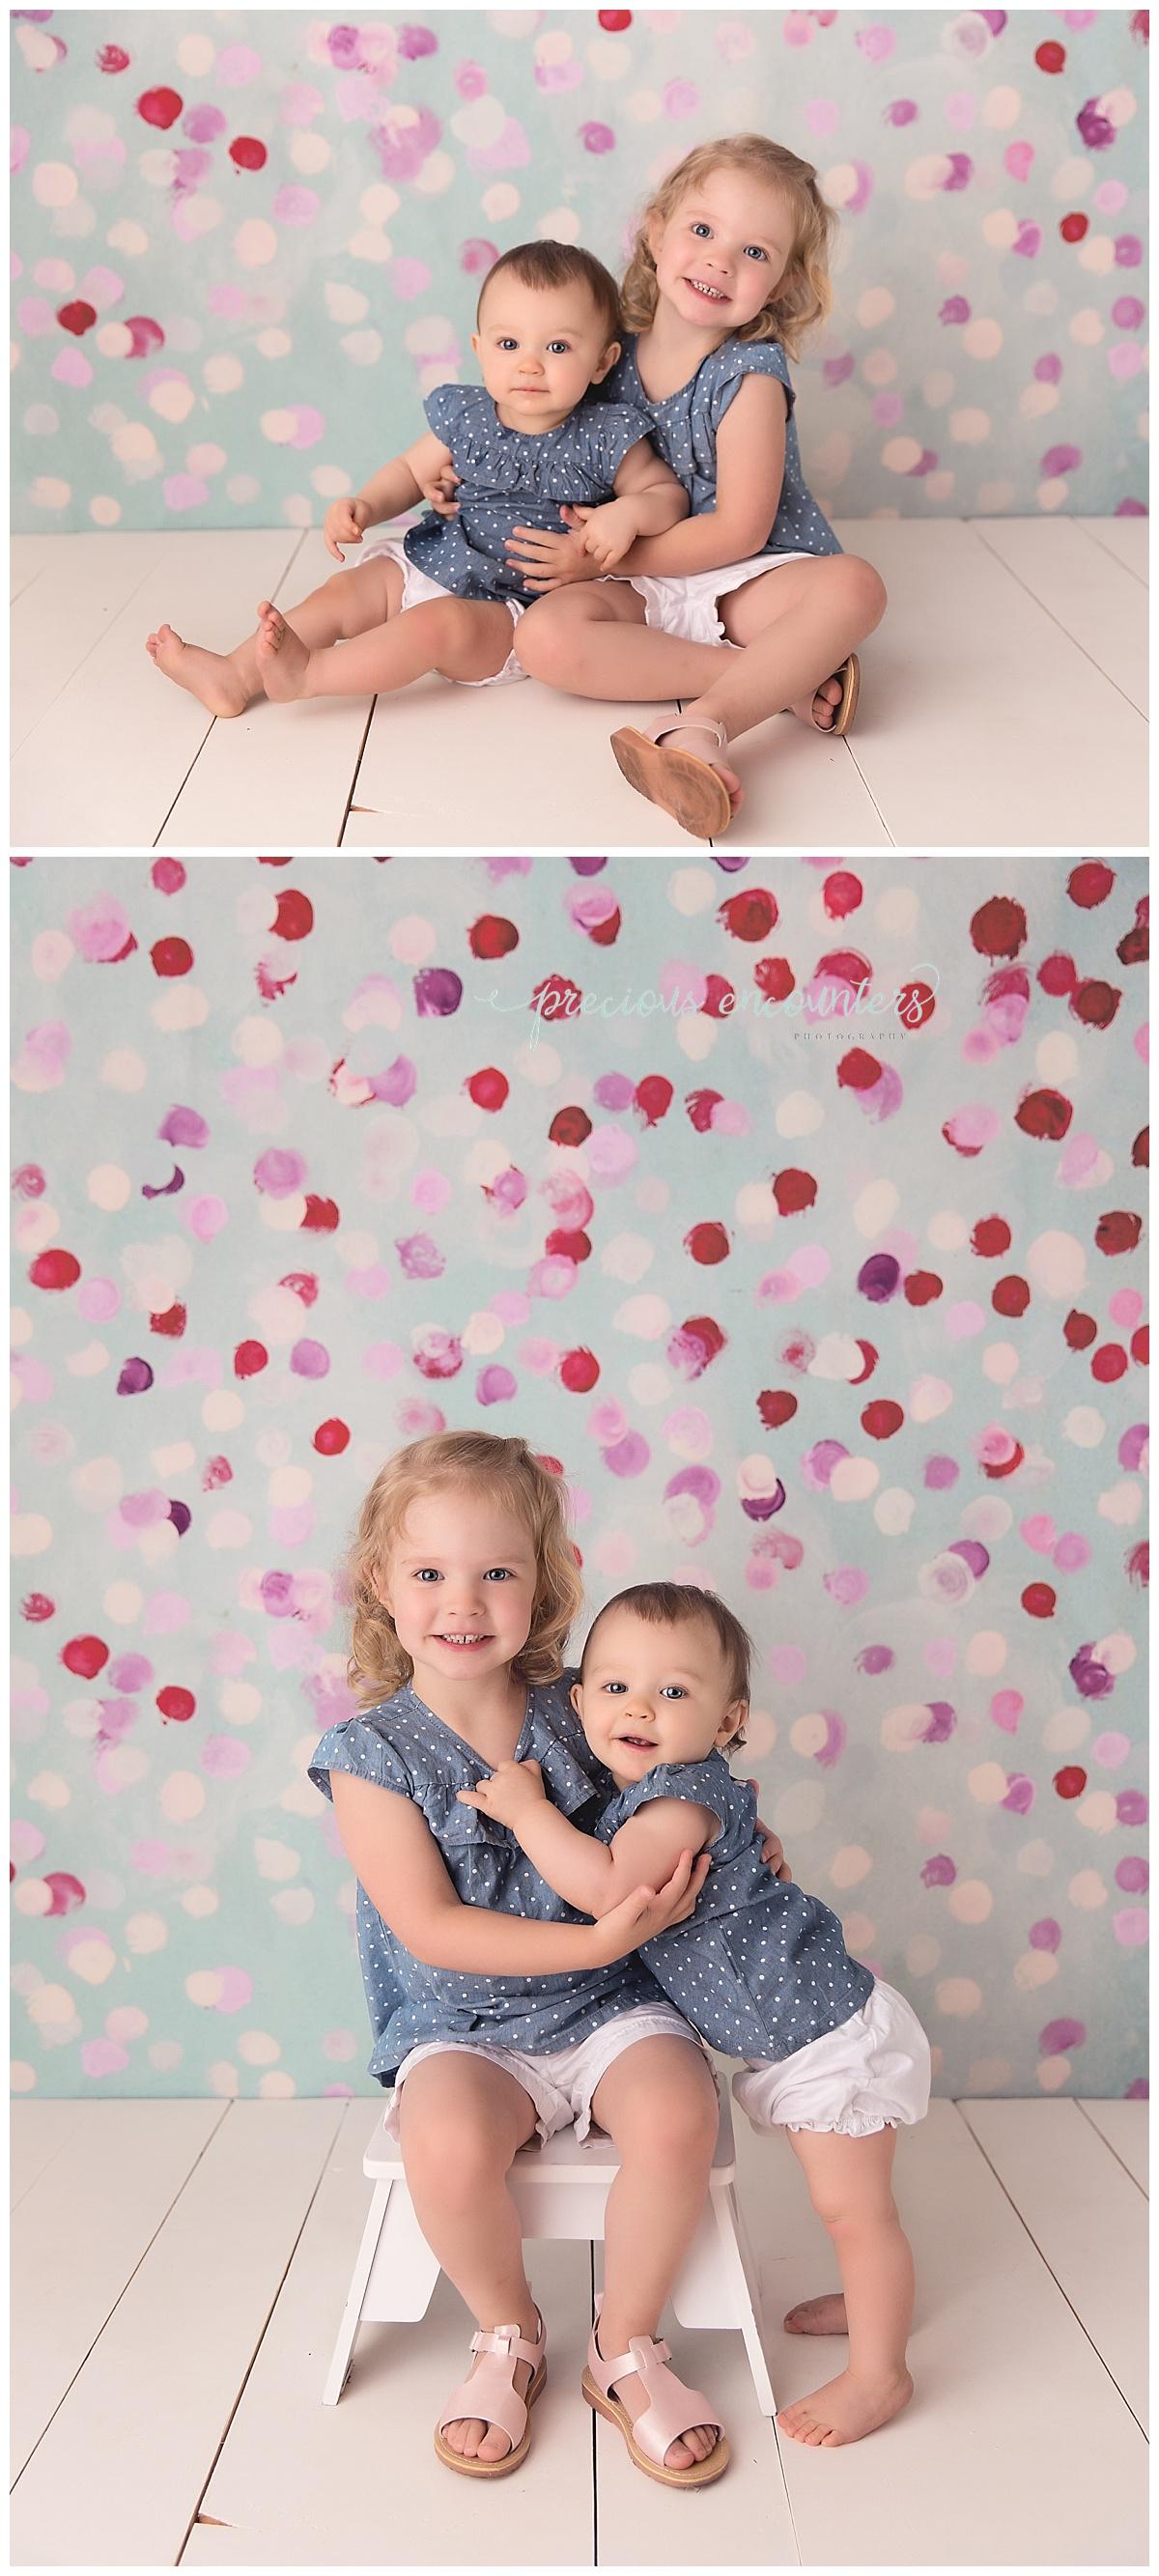 siblings, blue, white, pink, purple, portraits